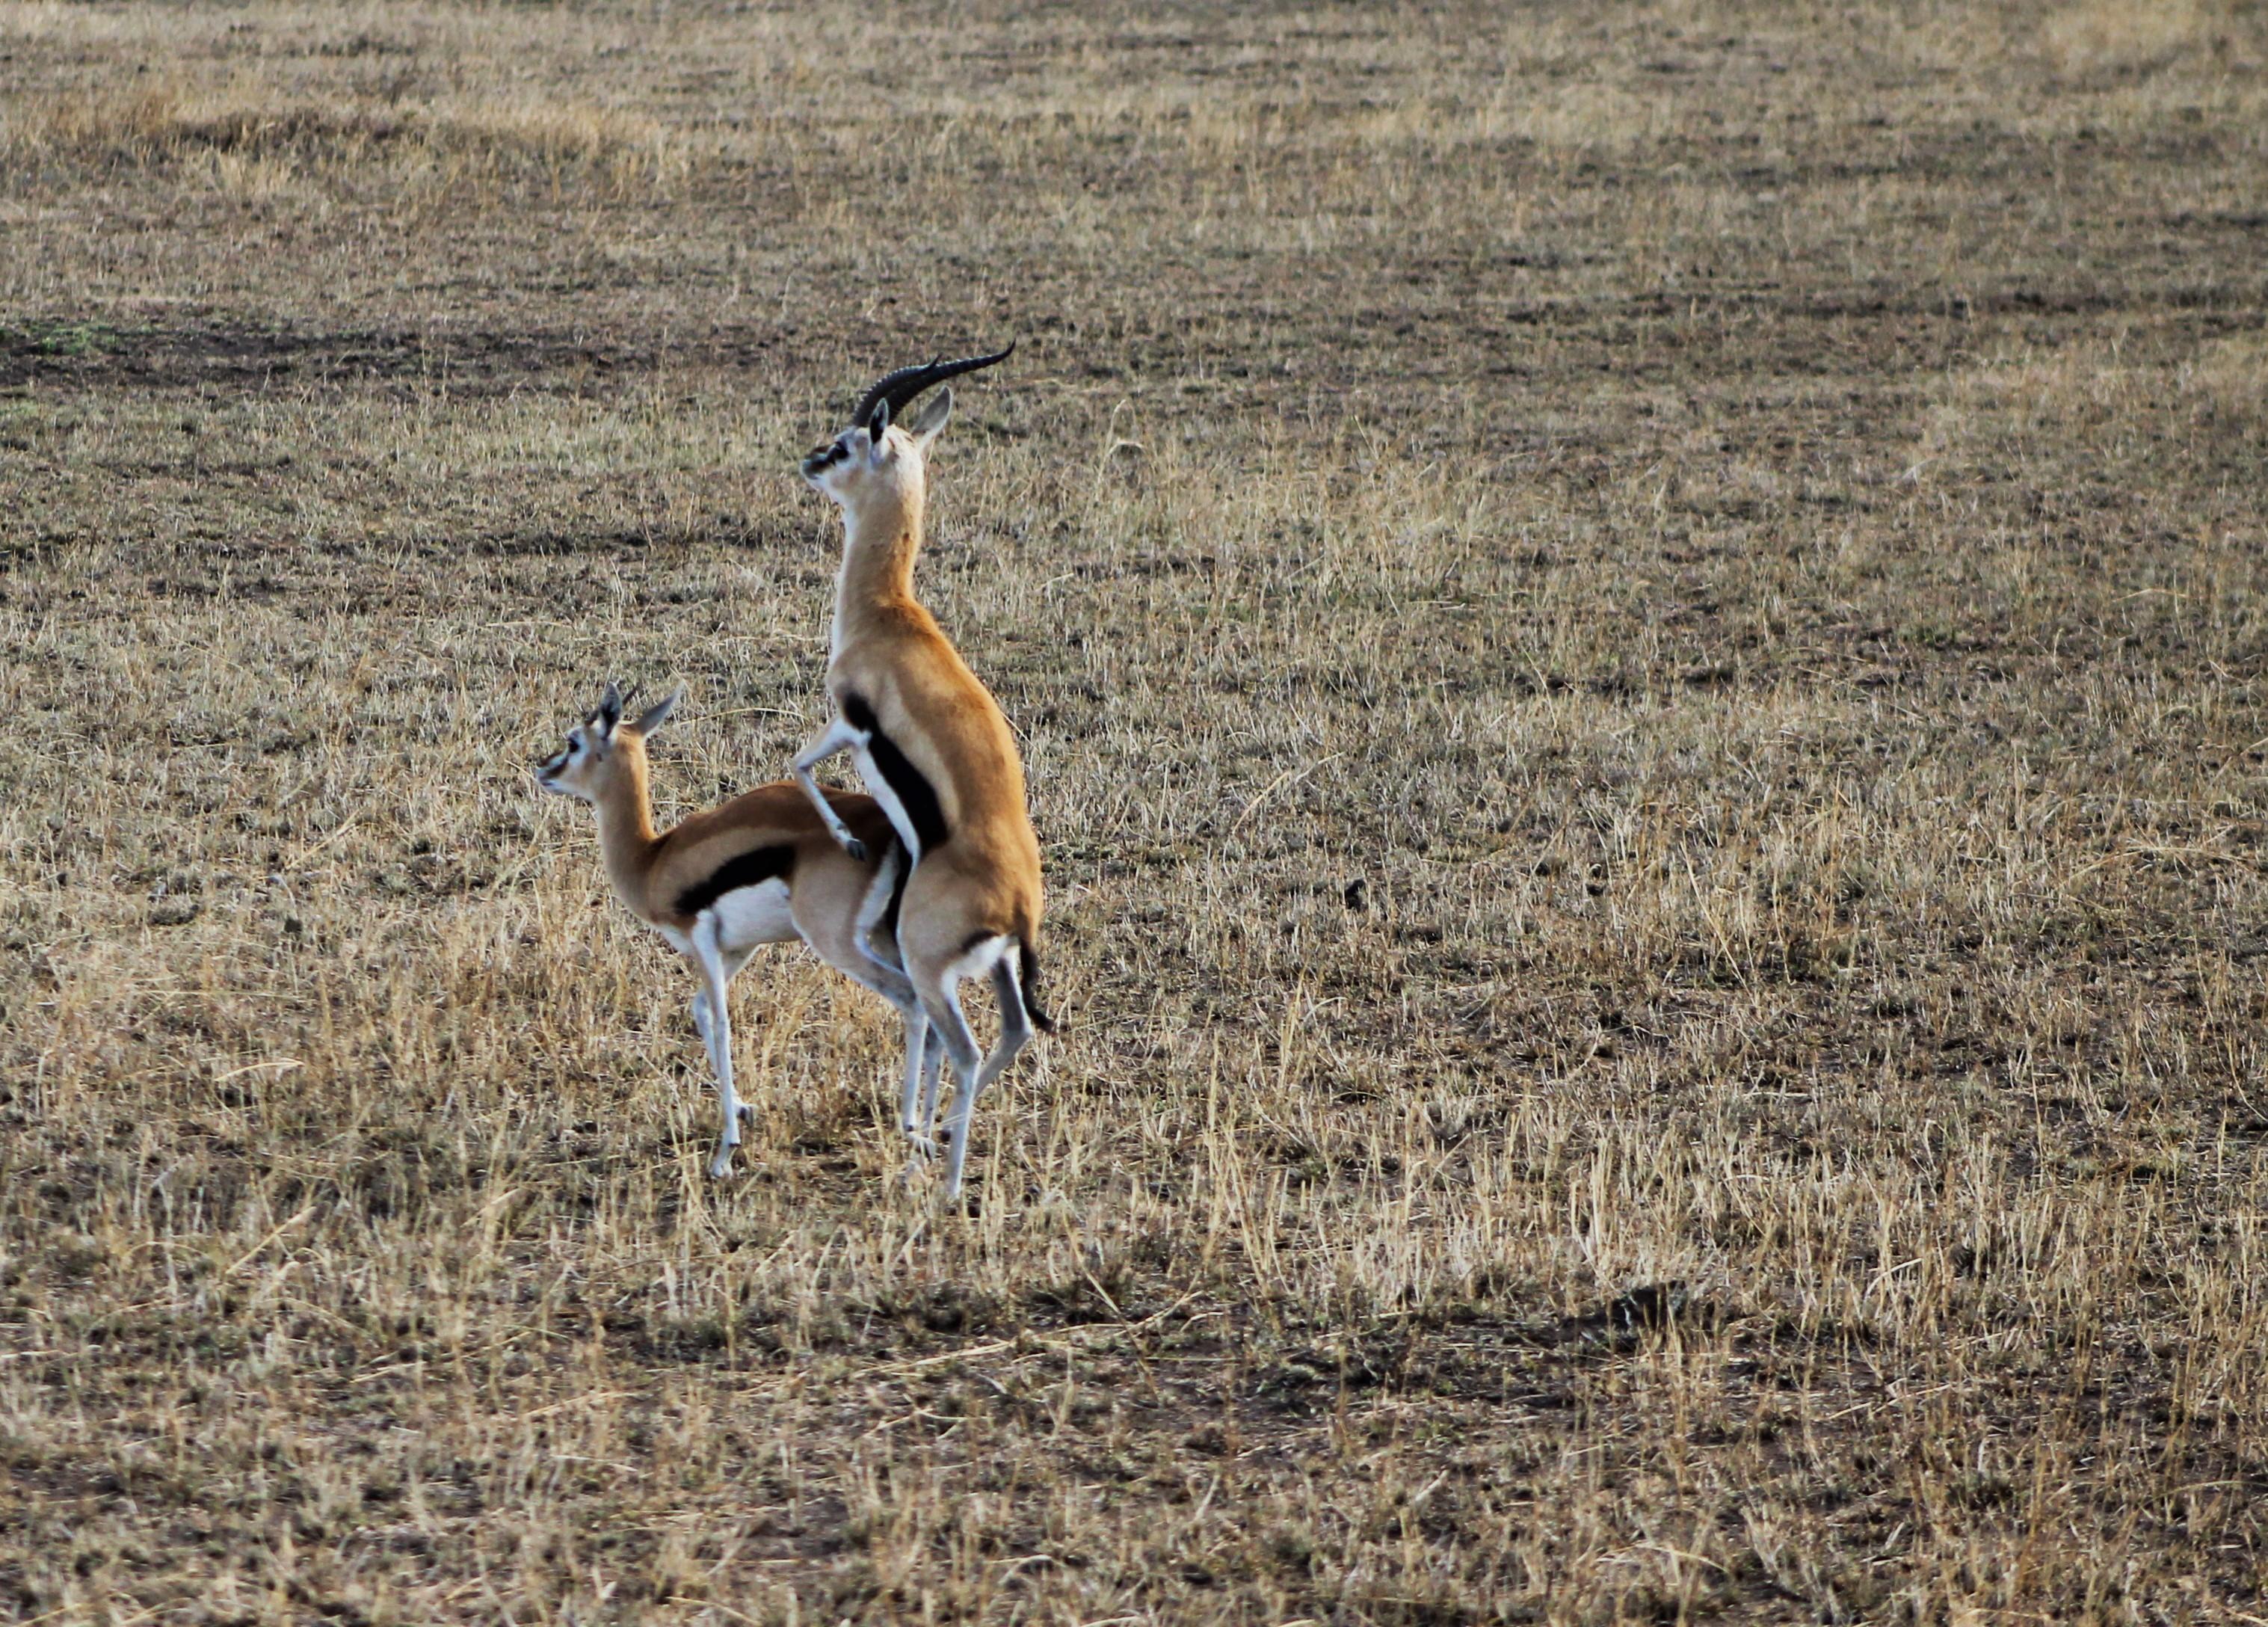 Gazelle sex